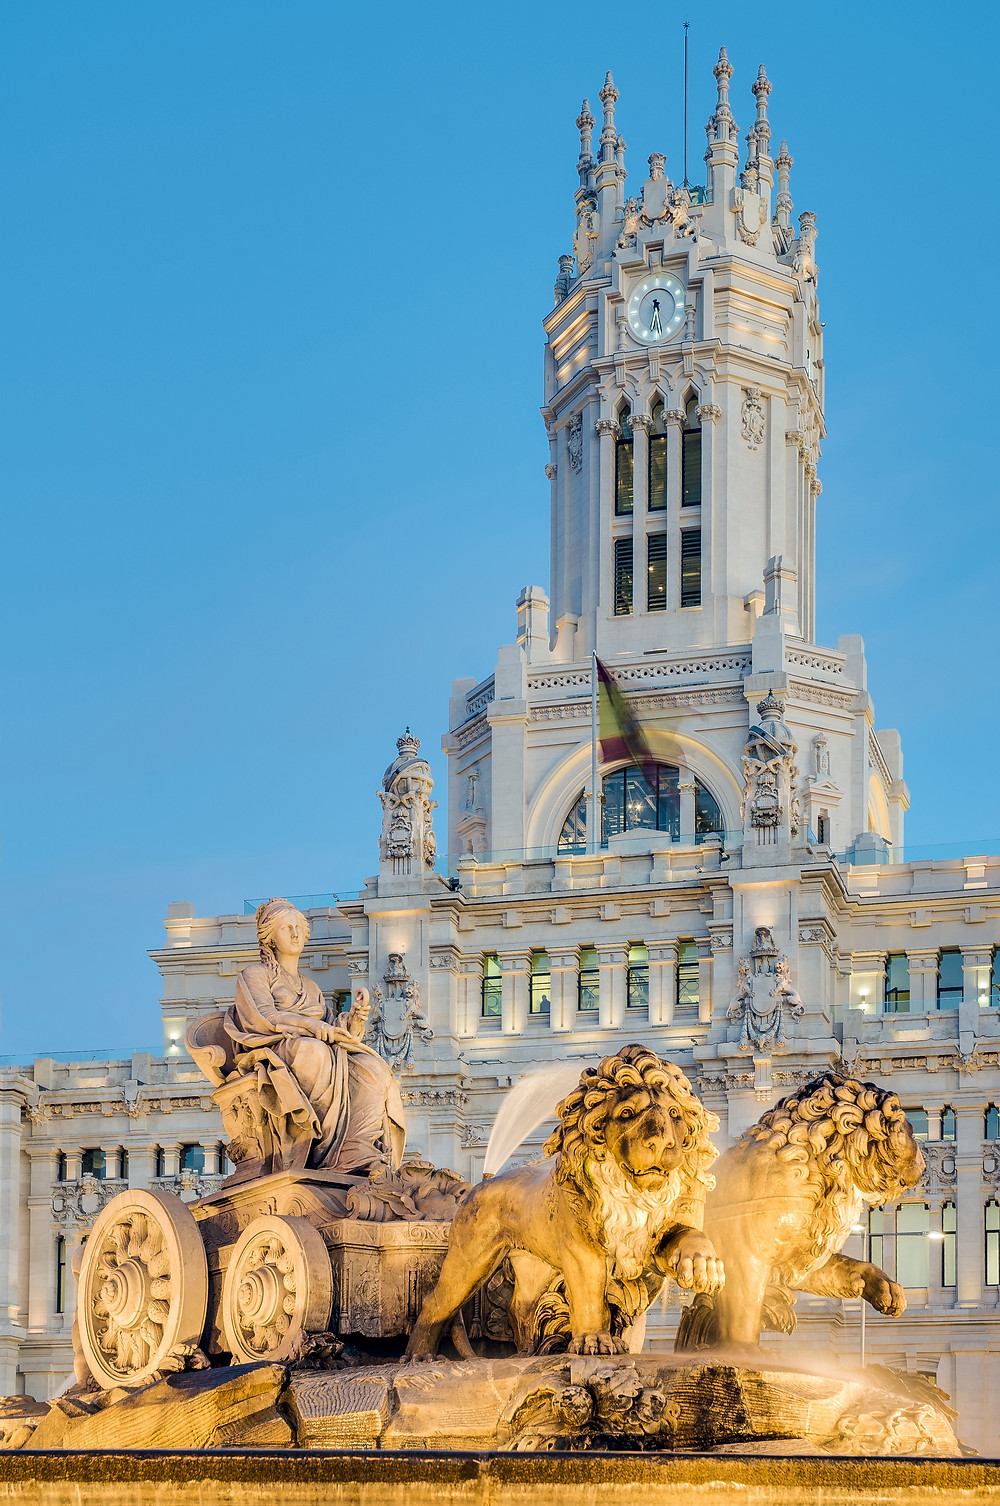 Cibeles Fountain in Cibeles Plaza in Madrid